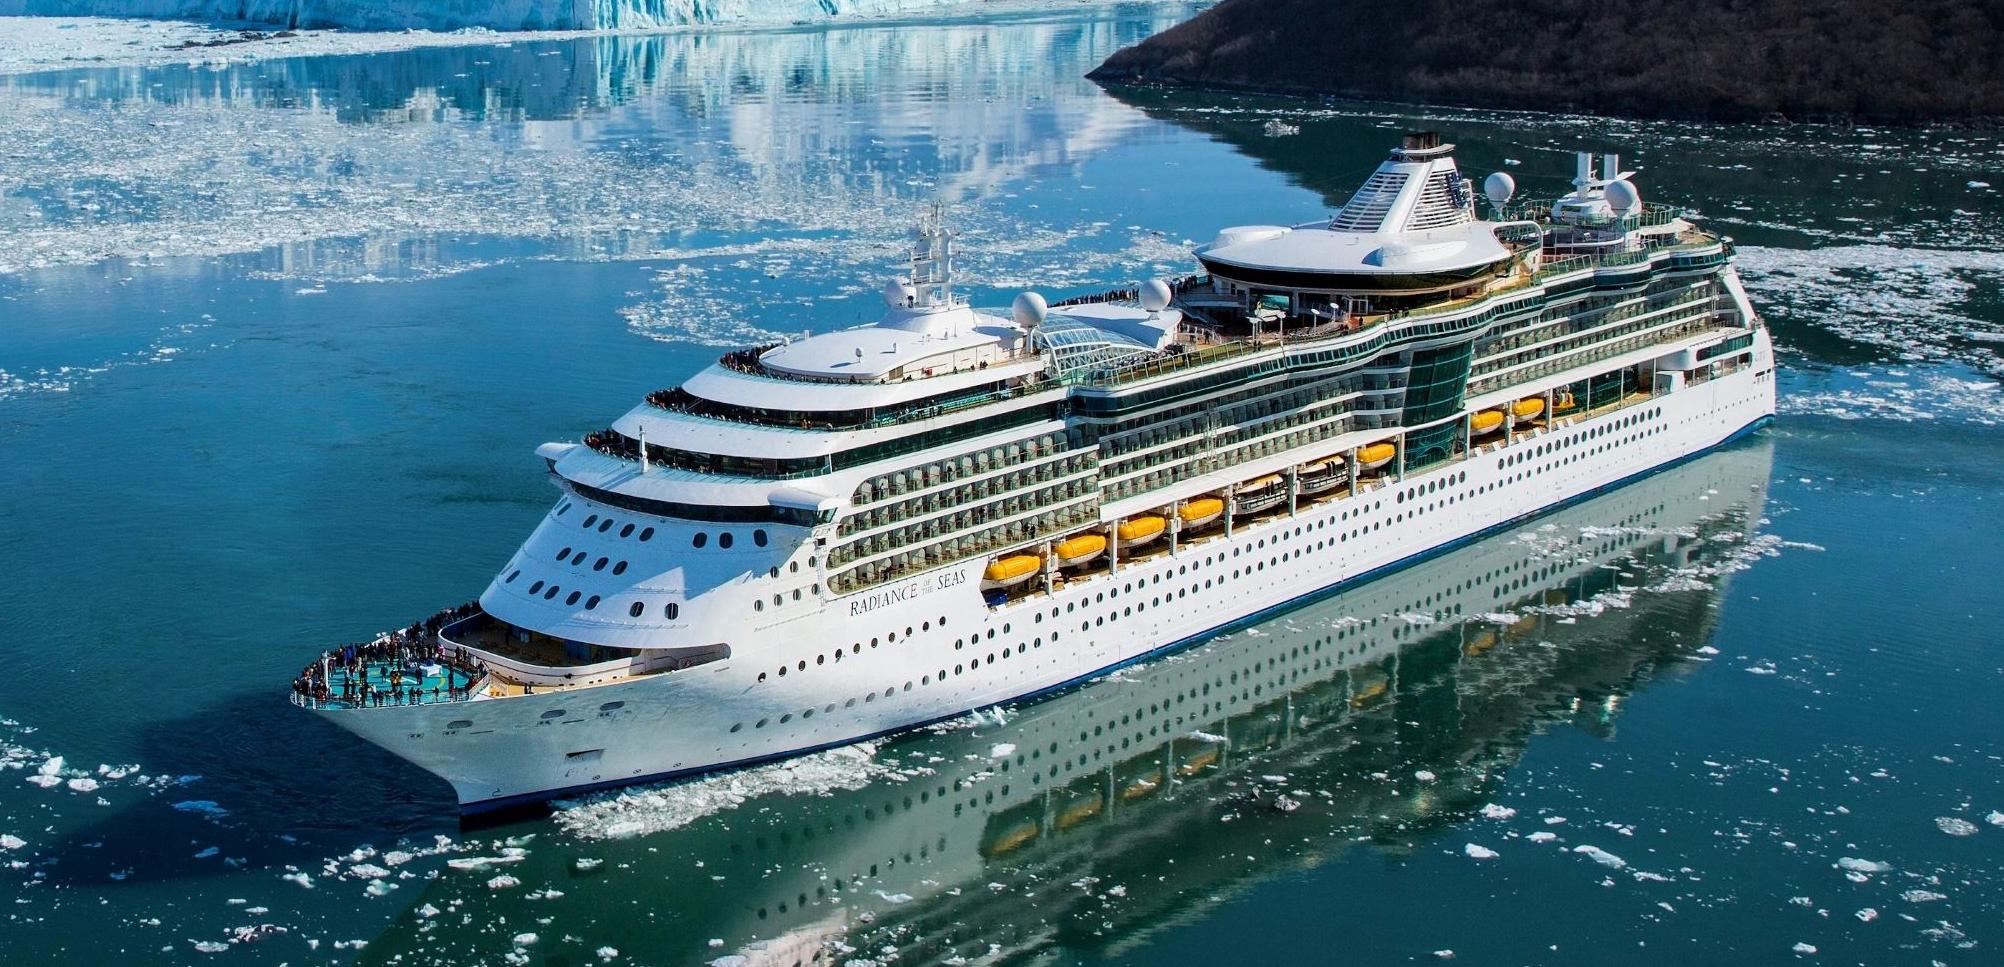 Royal Caribbean's <em>Radiance of the Seas</em>